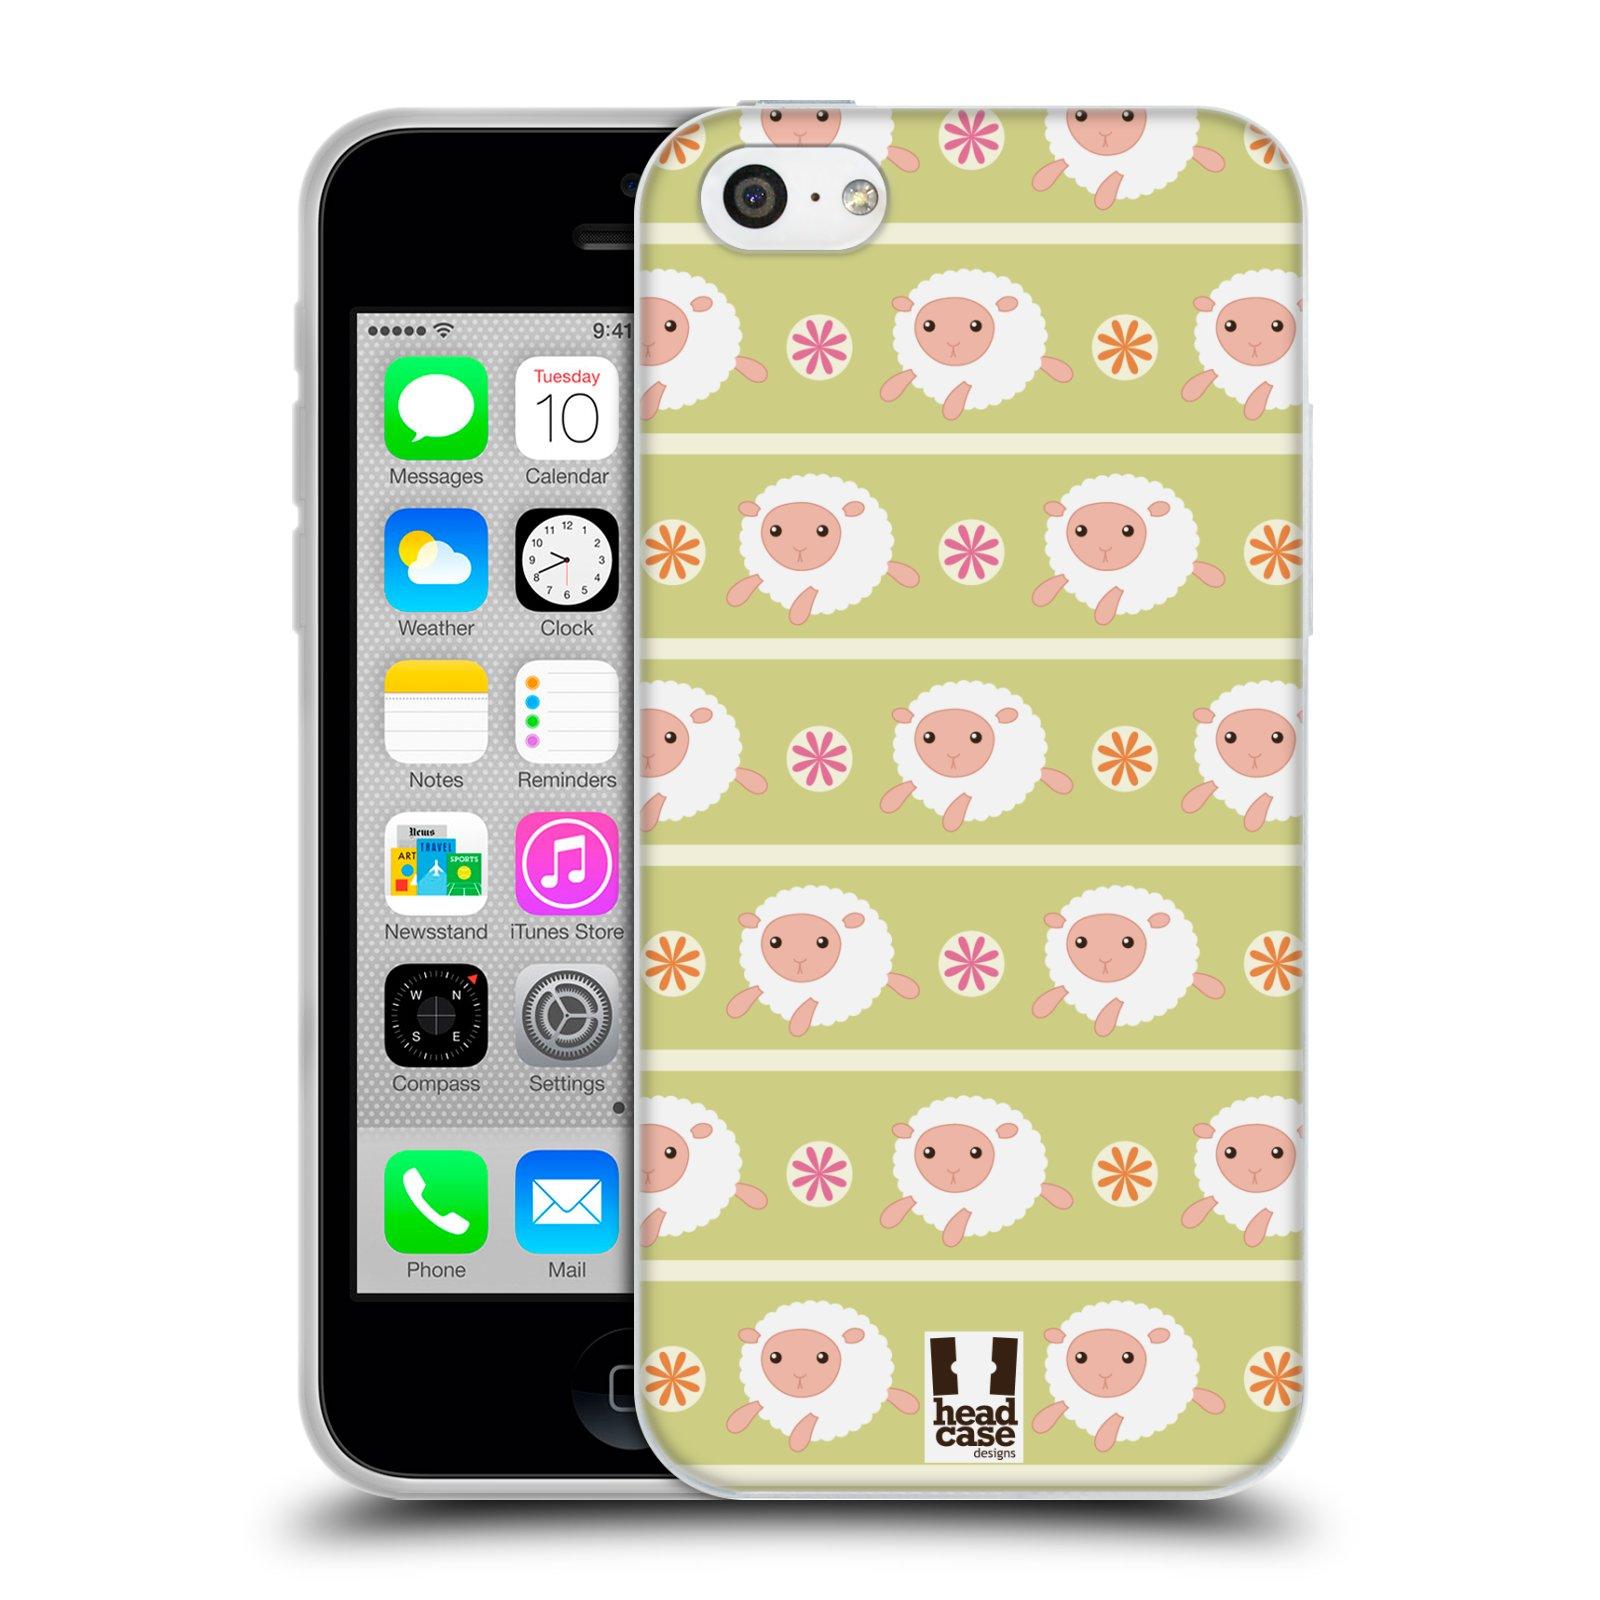 HEAD CASE silikonový obal na mobil Apple Iphone 5C vzor roztomilé zvířecí vzory ovečky